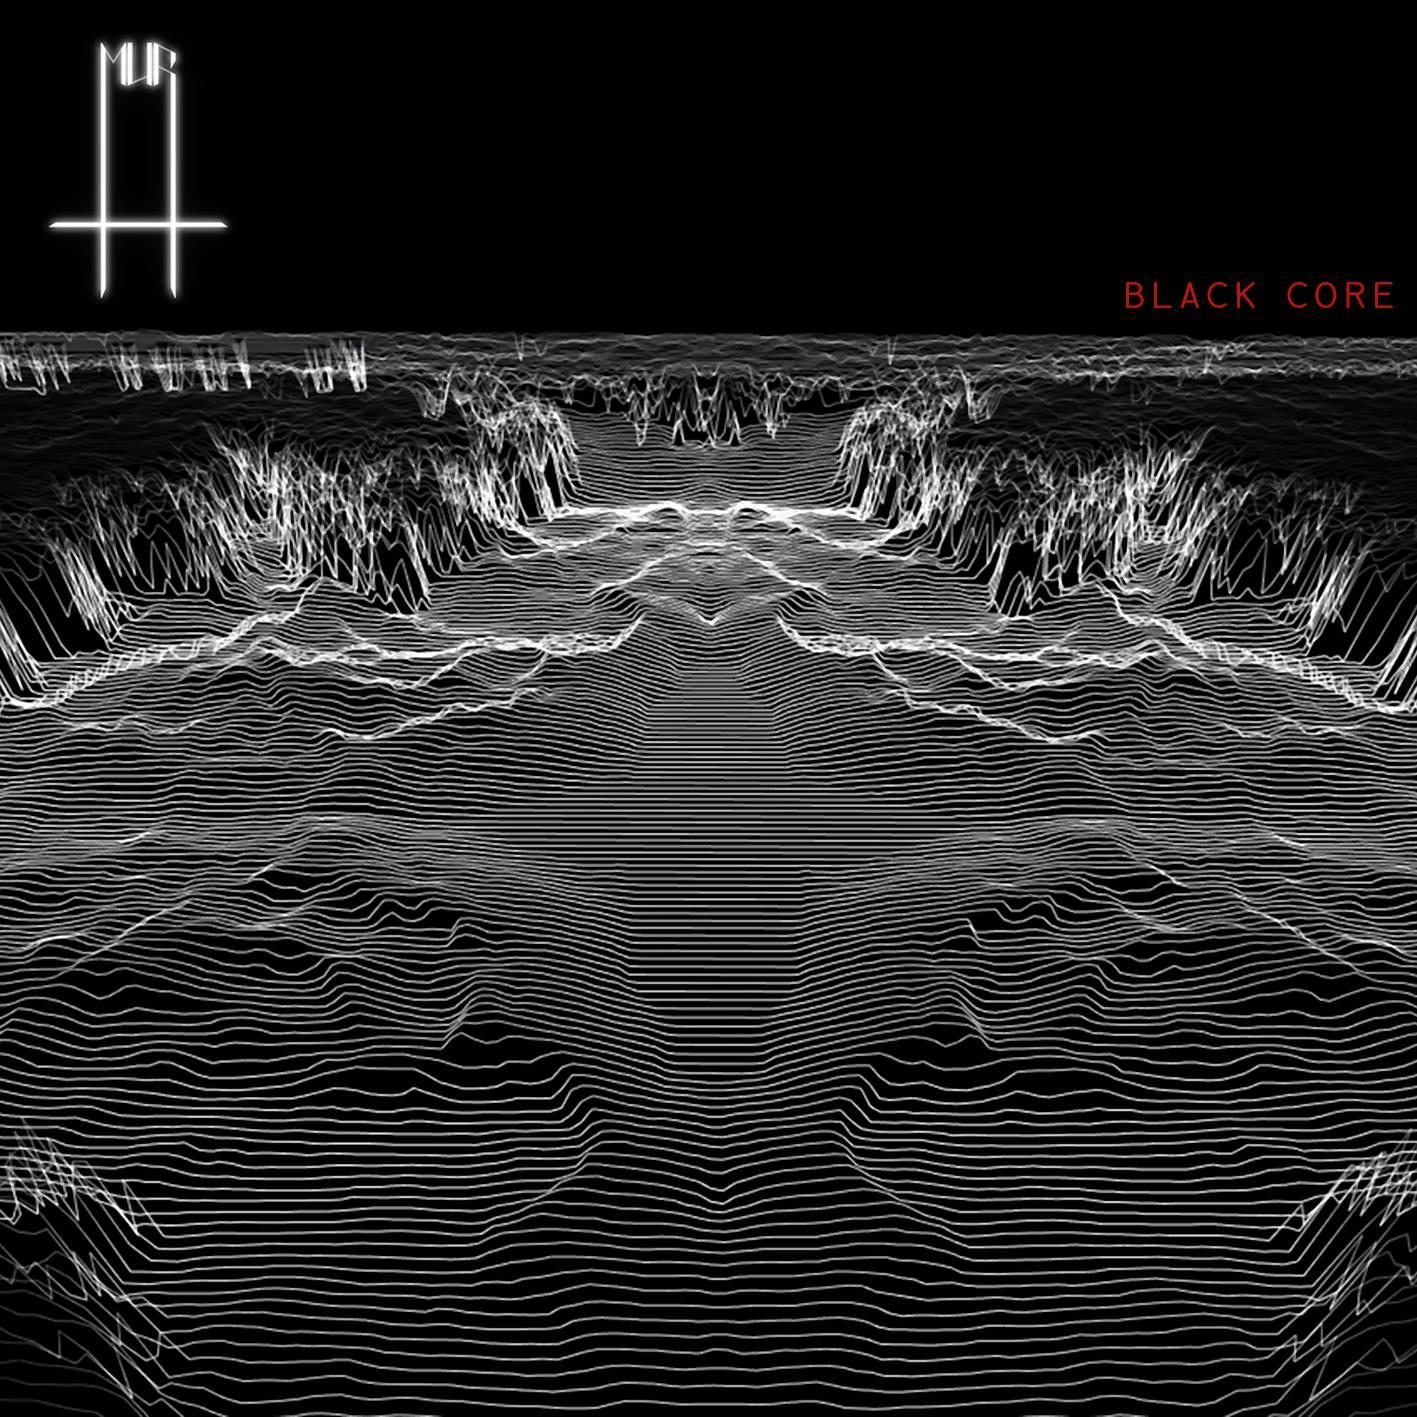 mur black core